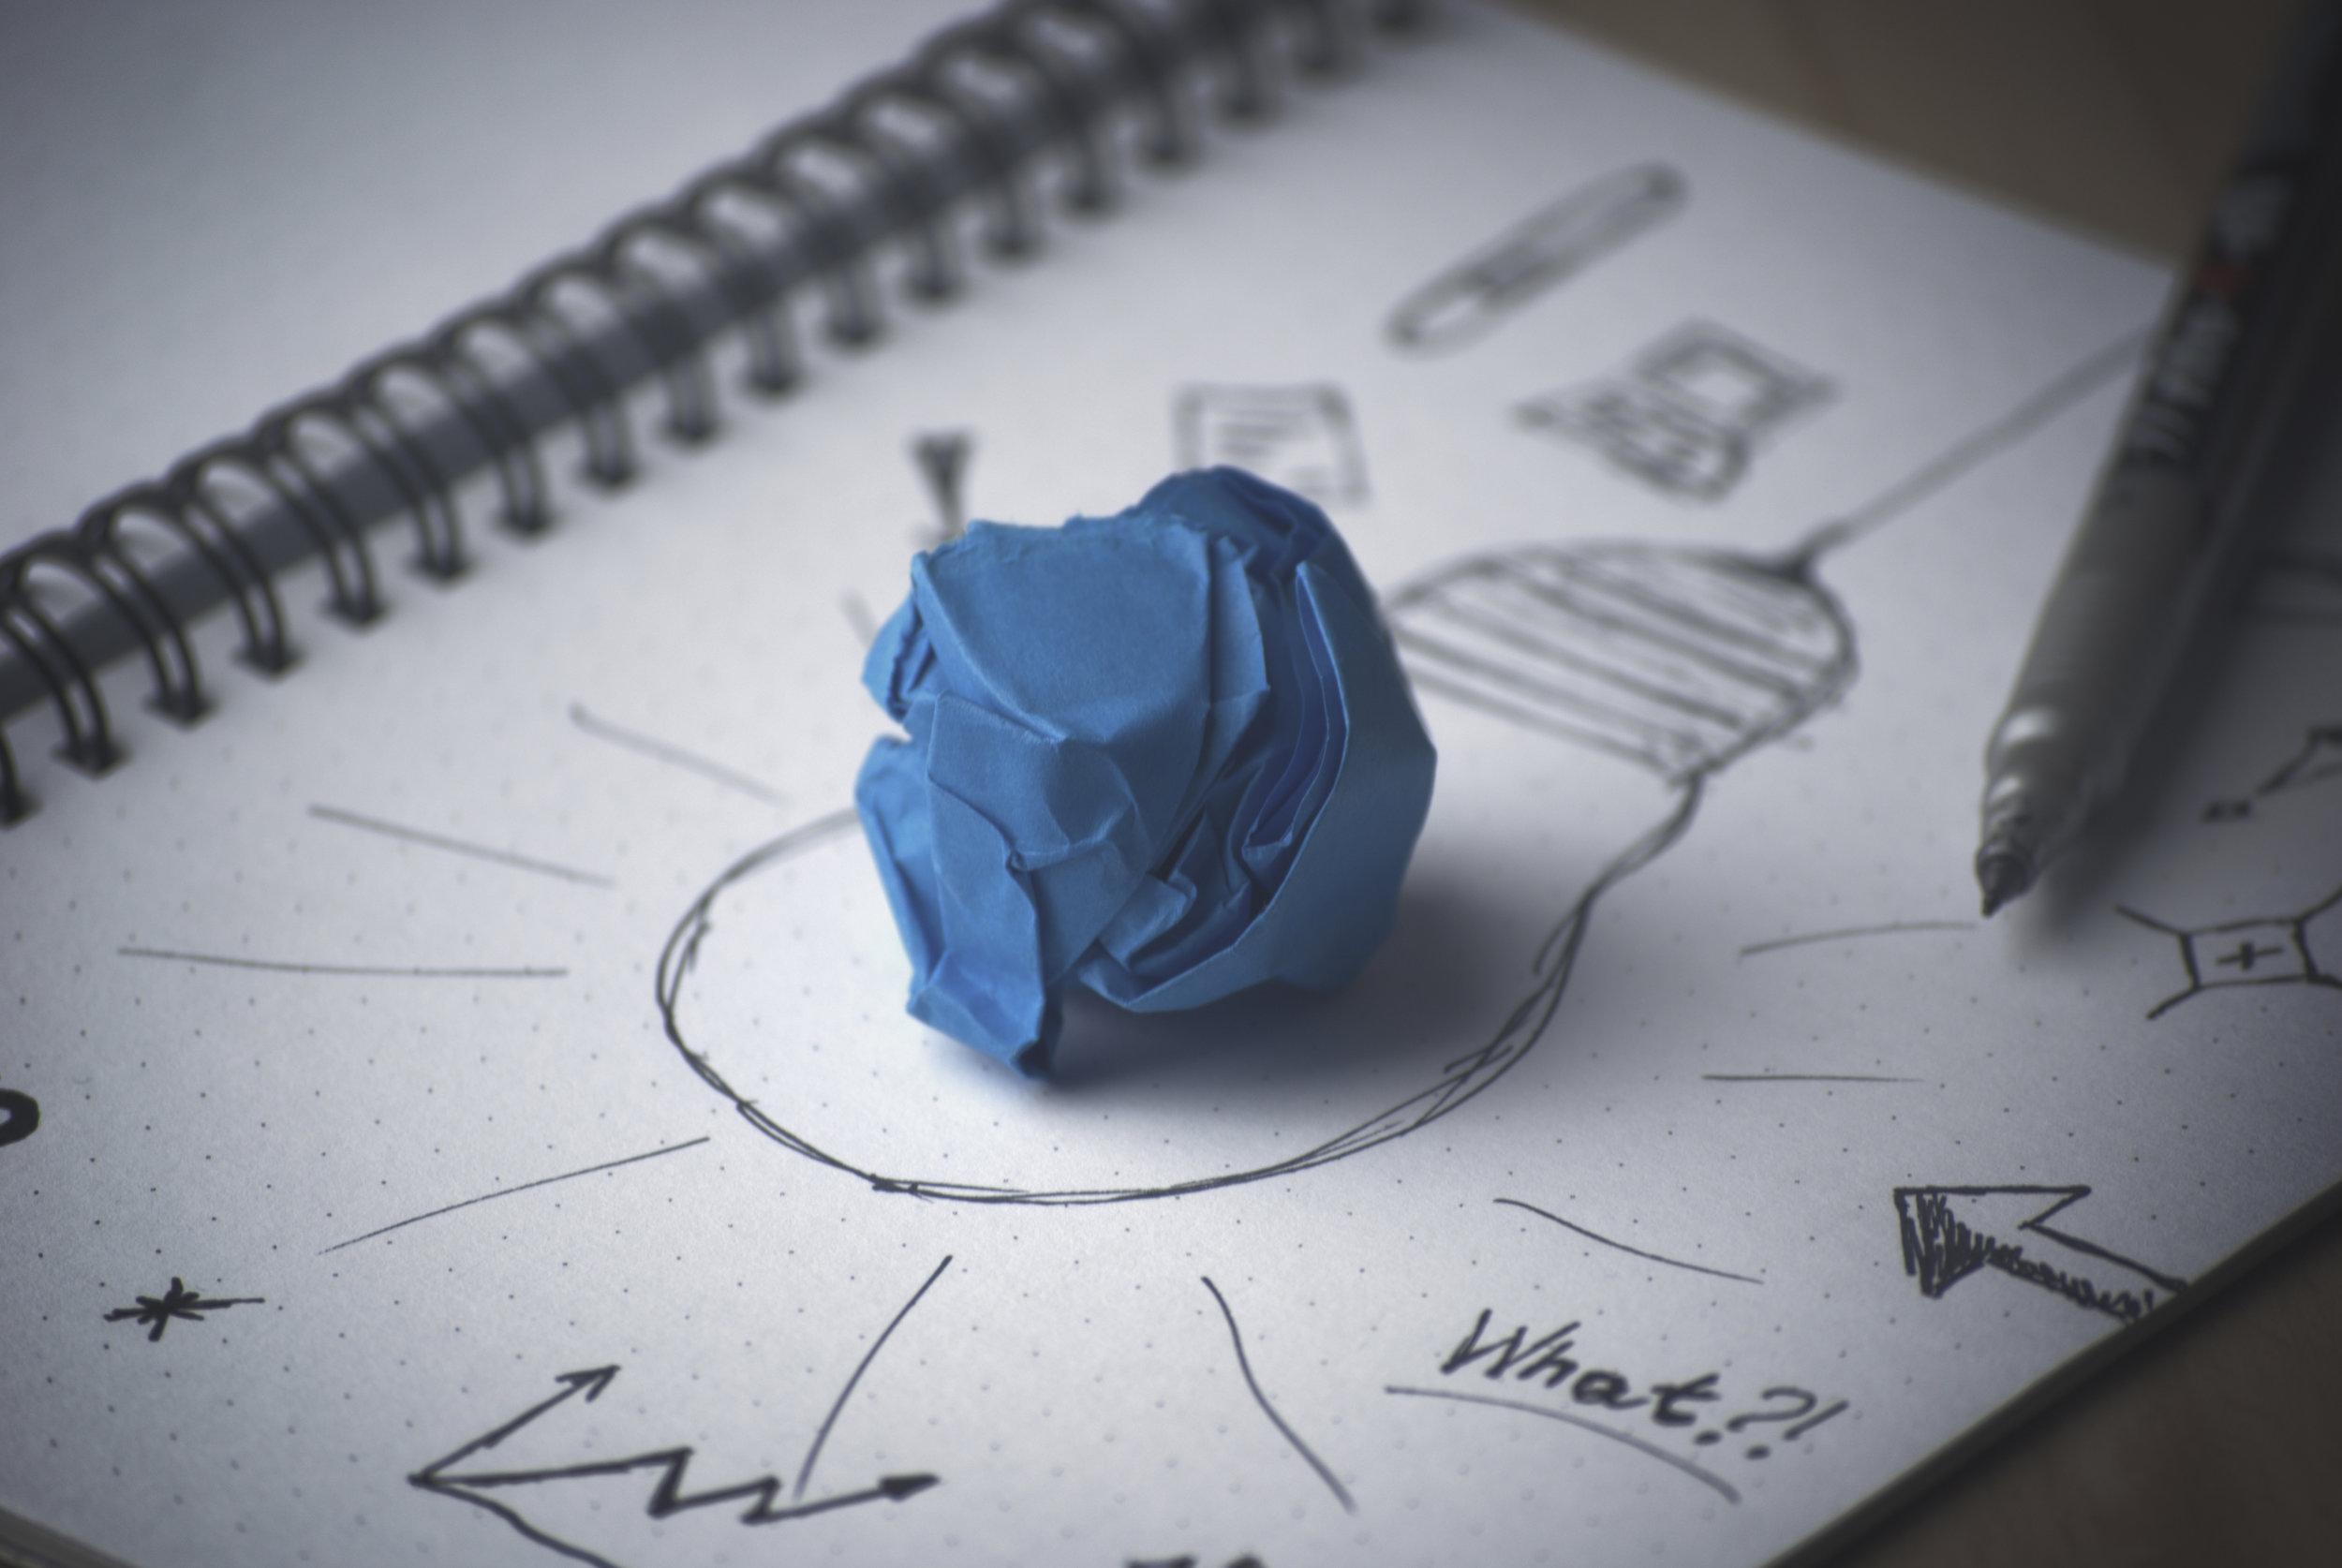 pen-idea-bulb-paper.jpg